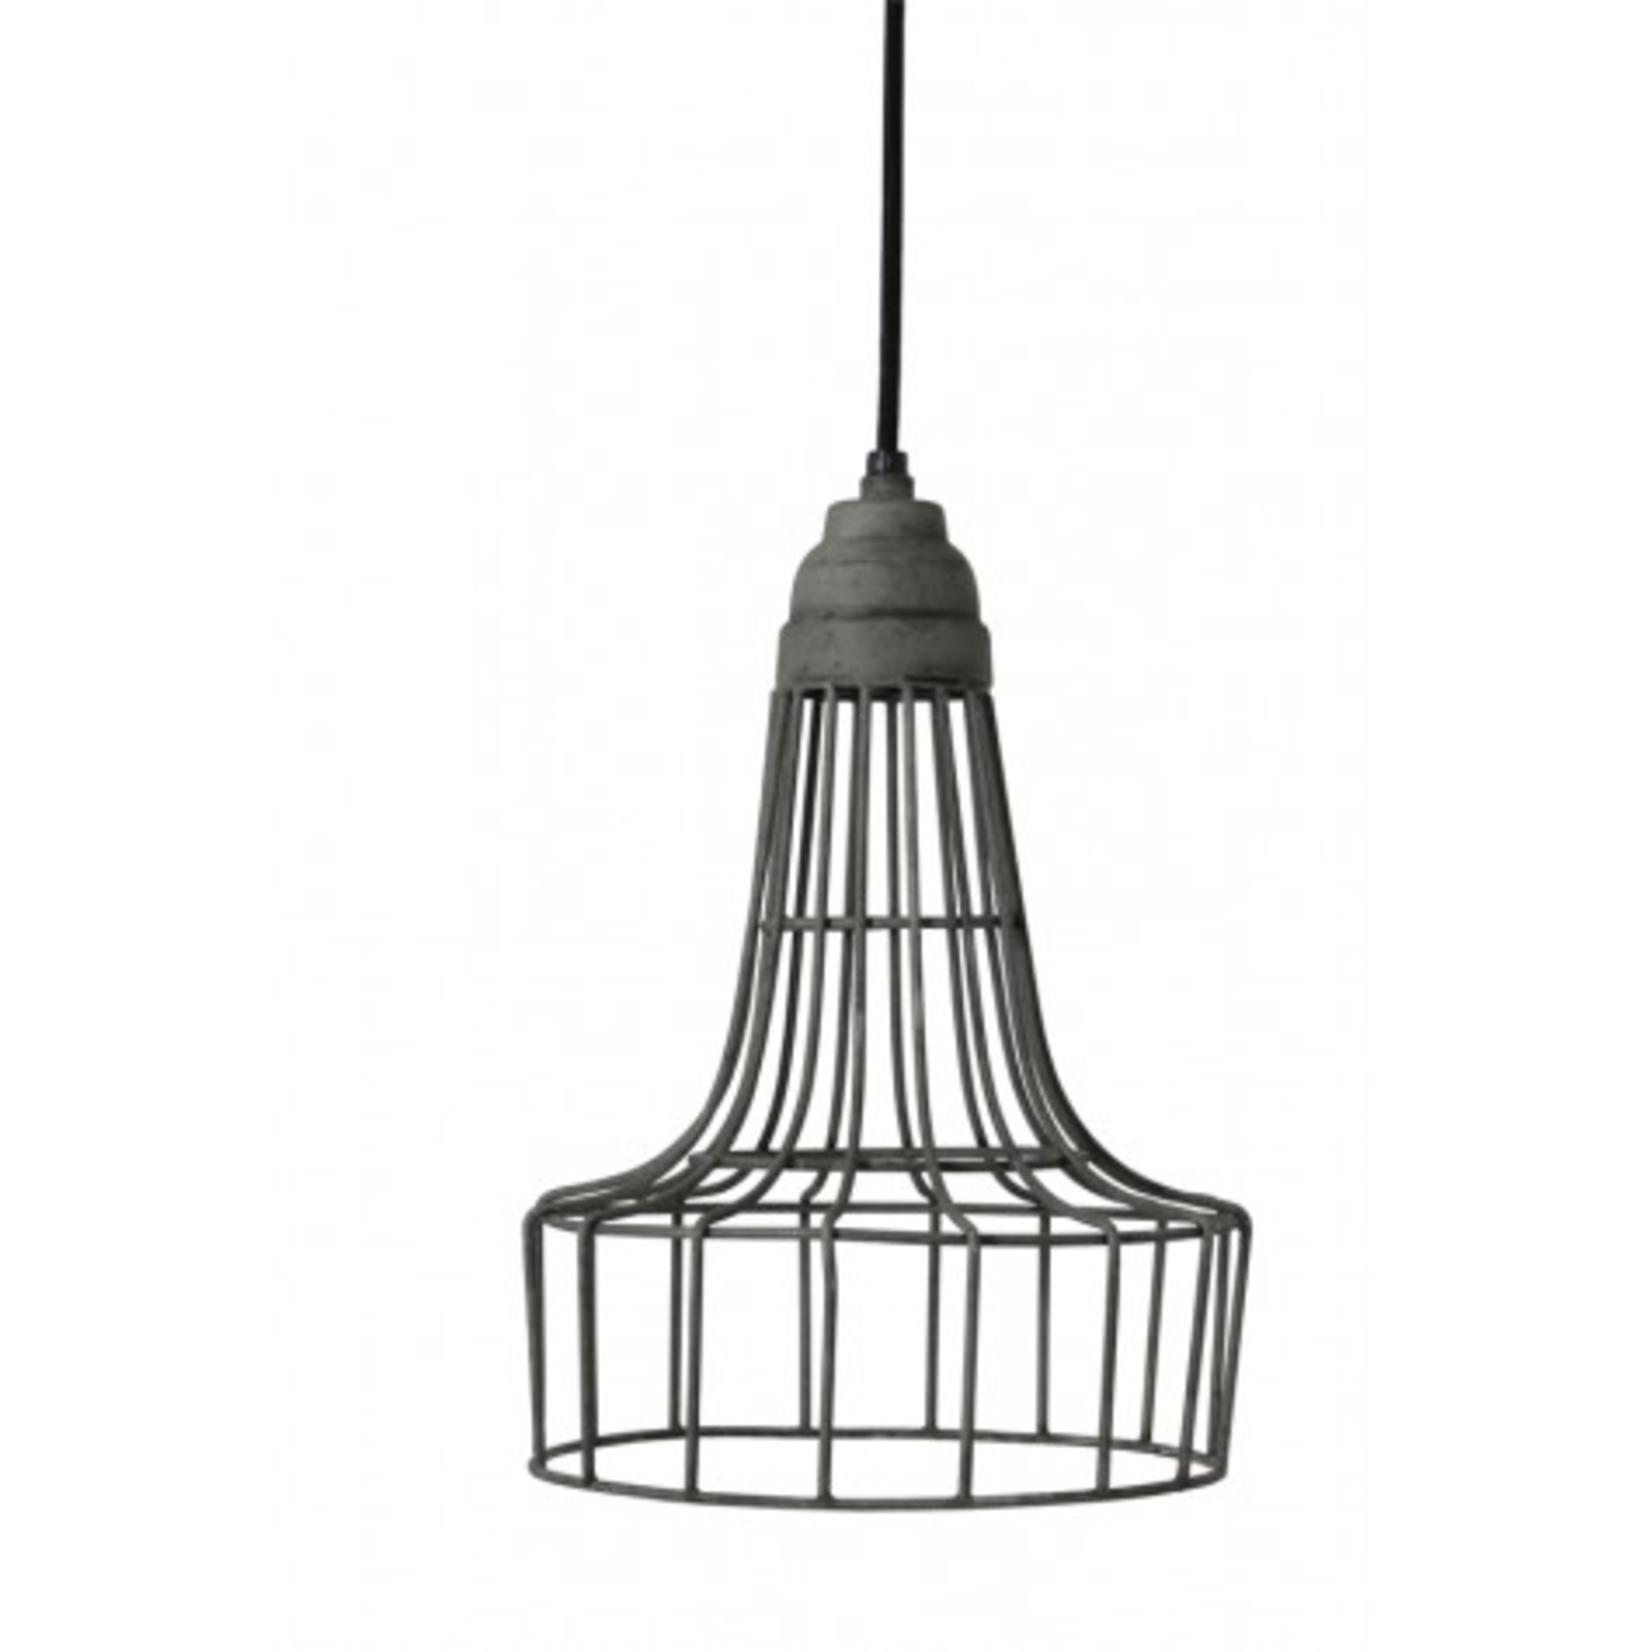 Light & Living Babette 20x30cm hanging wire cement lamp